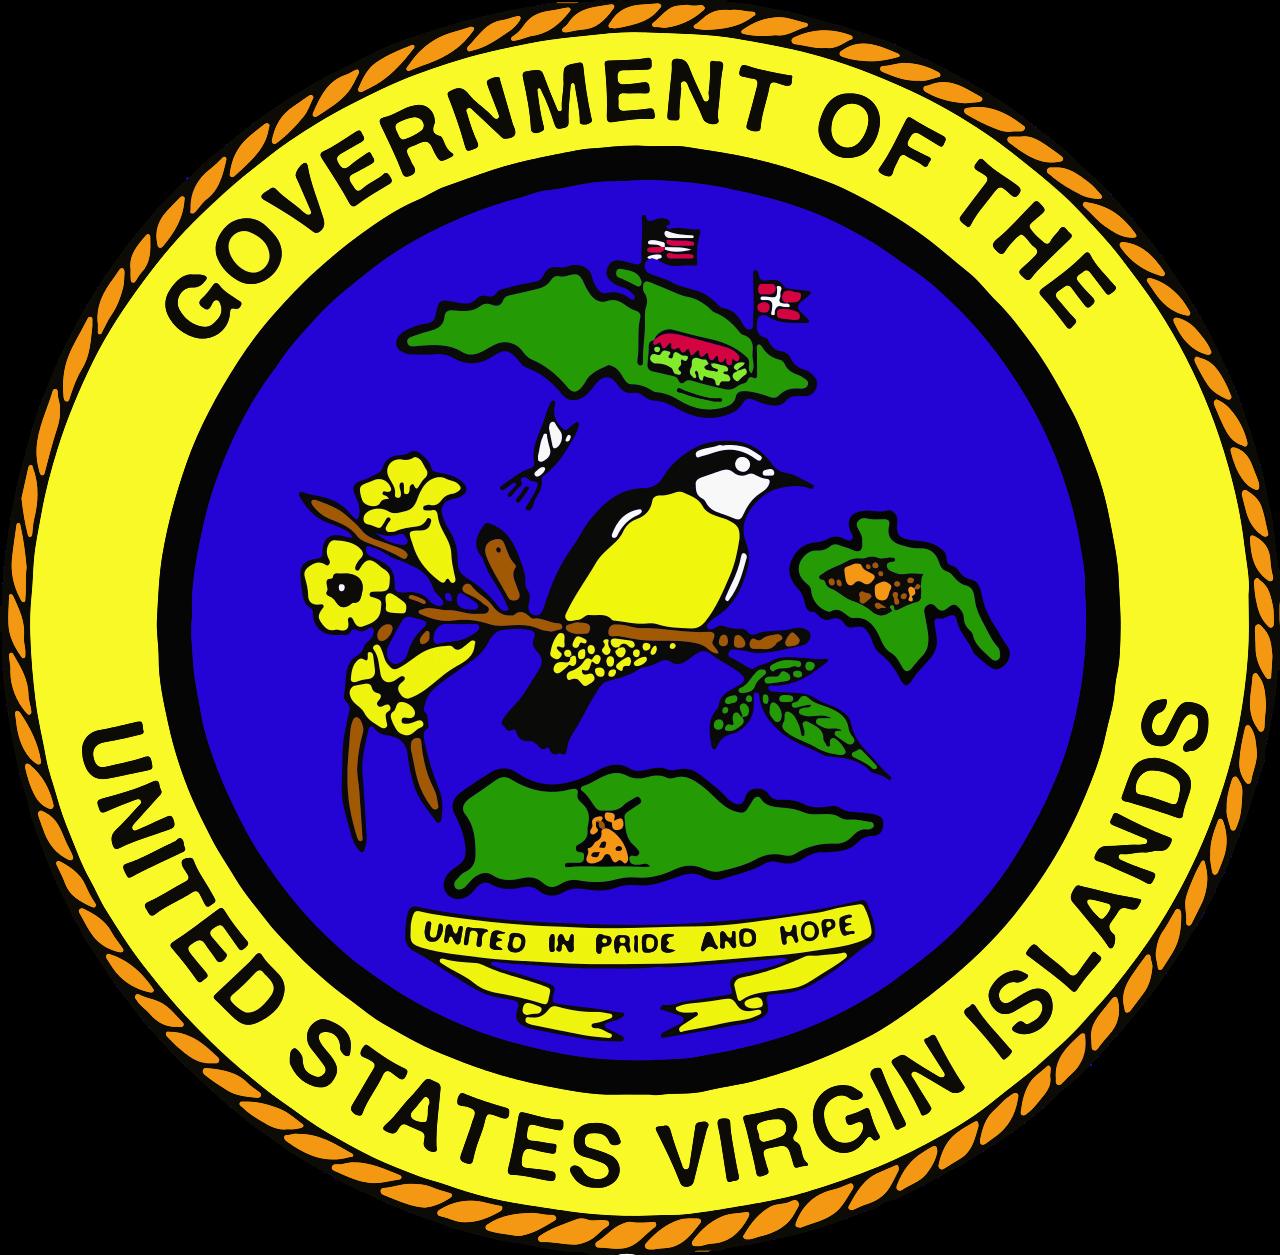 U.S. Virgin Islands seal